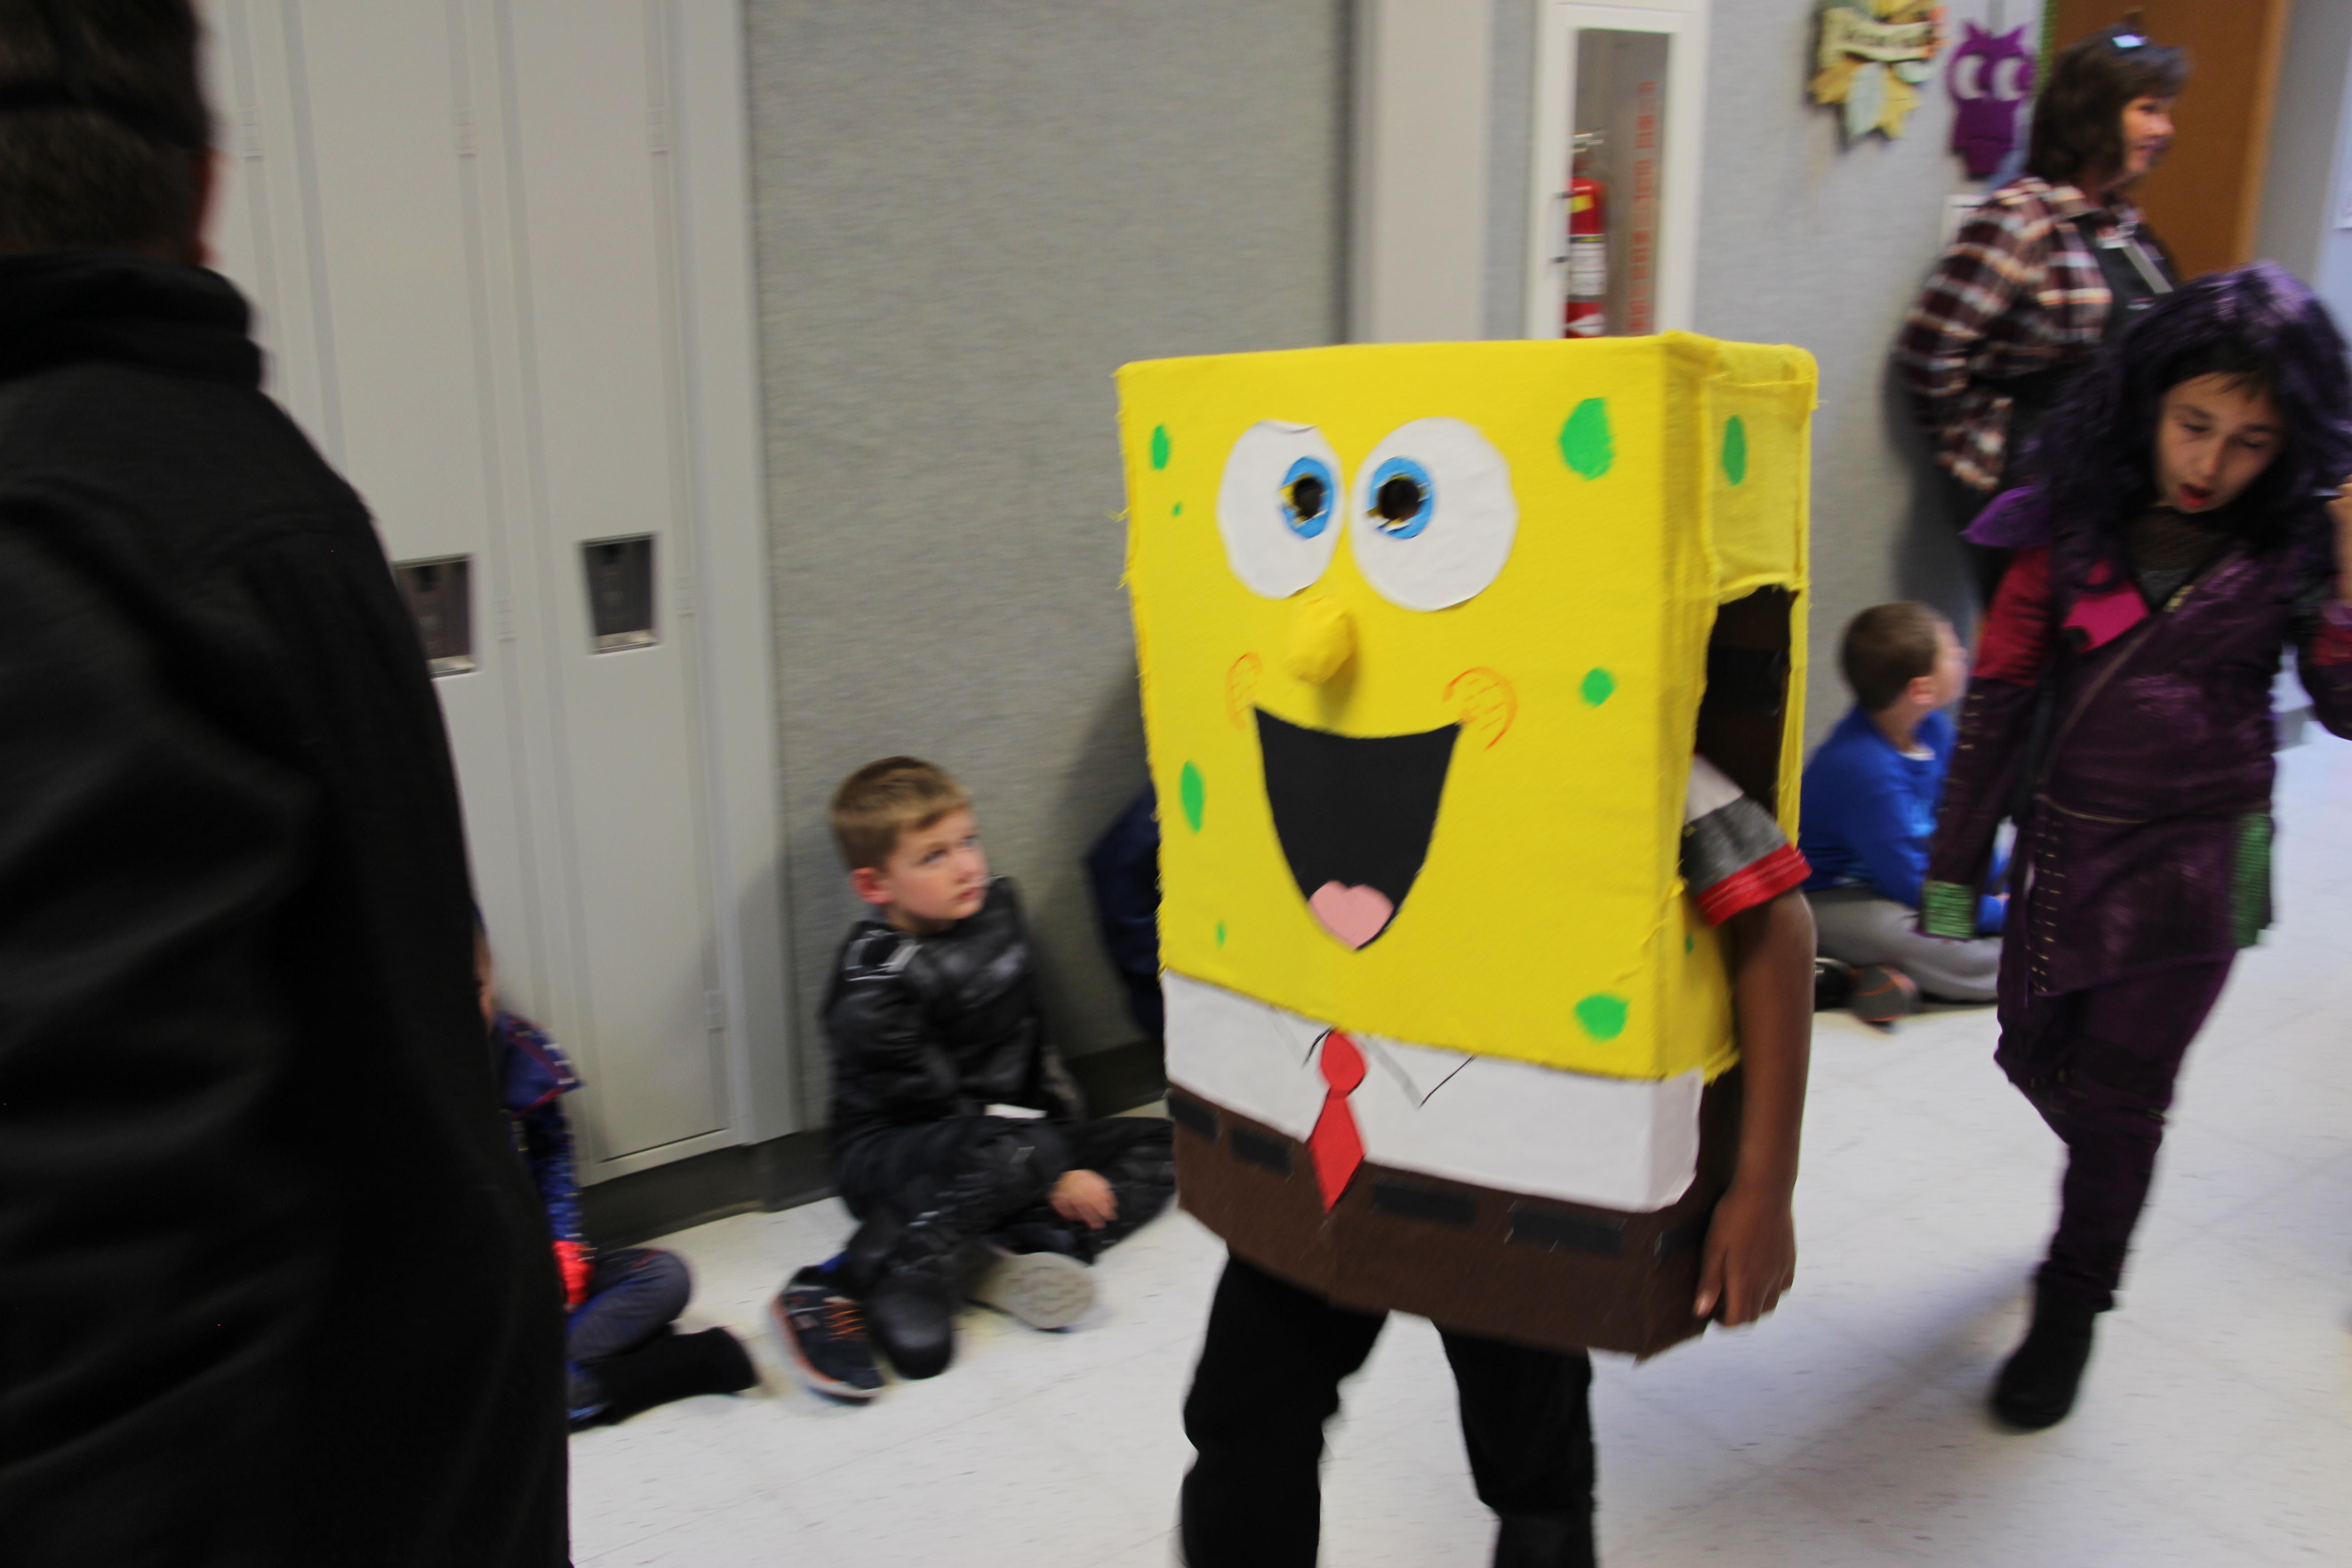 A student wears a Spongebob costume.